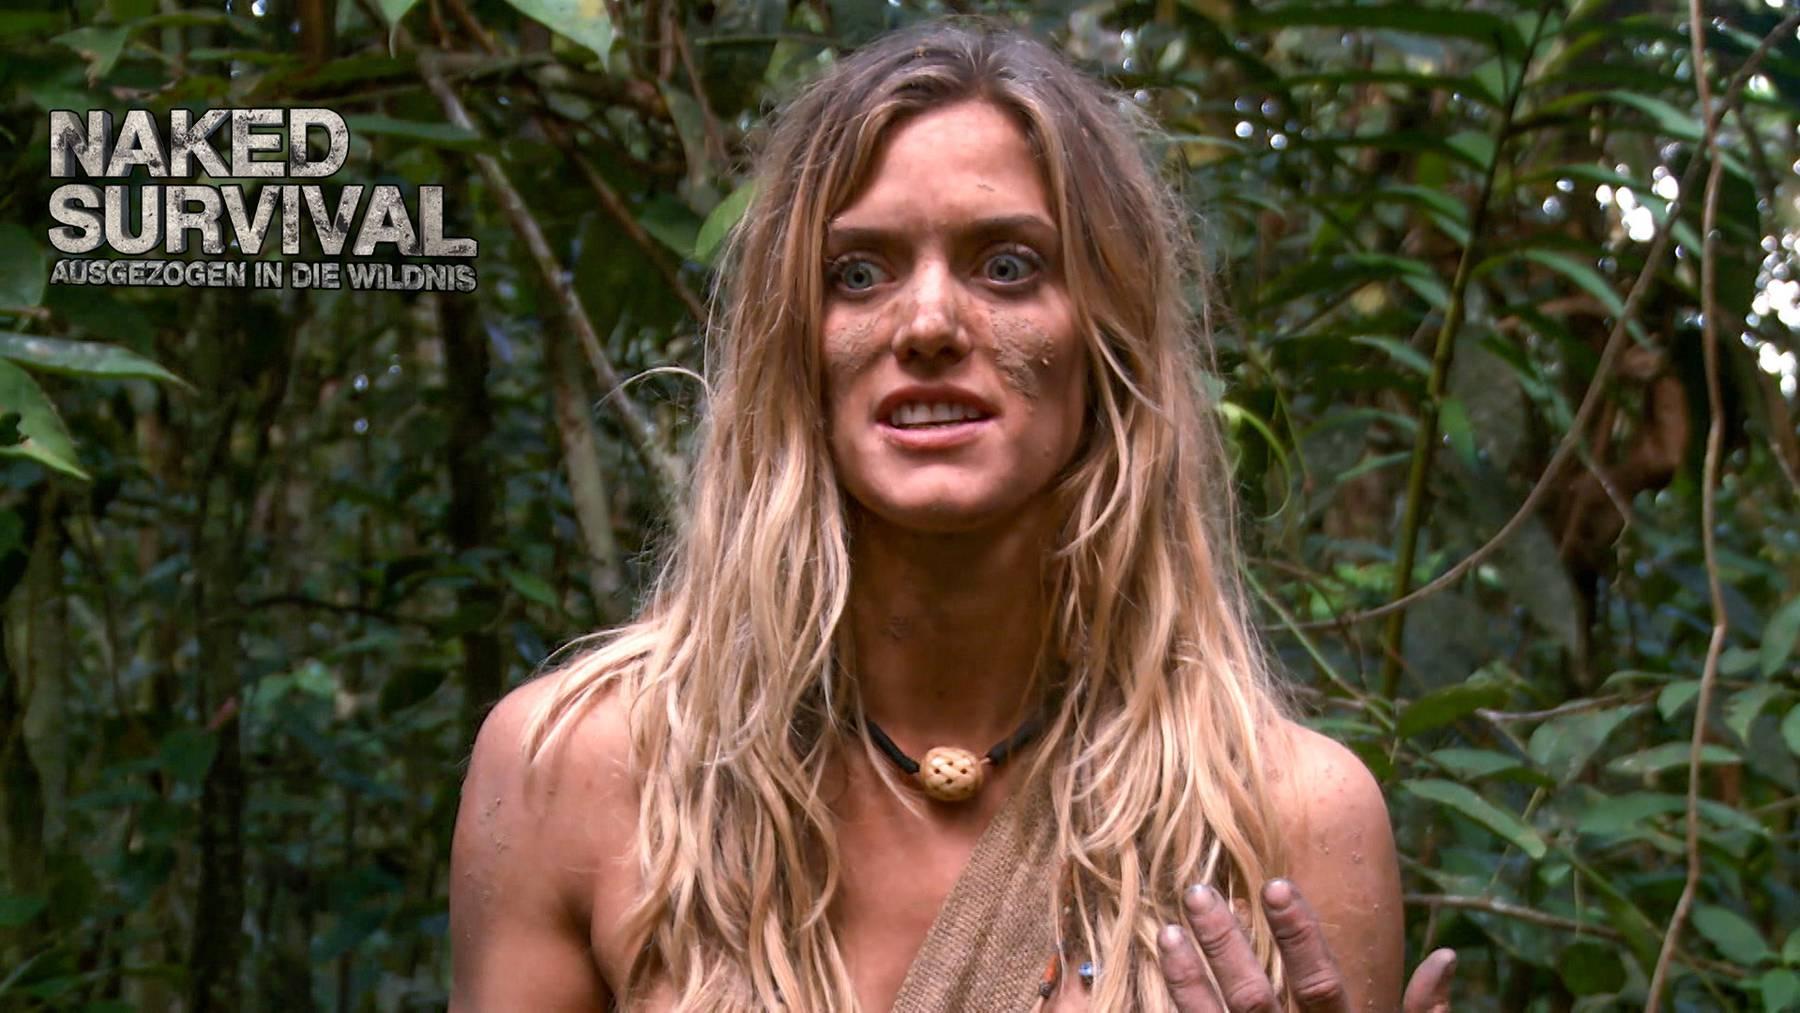 Folge 7 - Im Dschungel des Amazonas